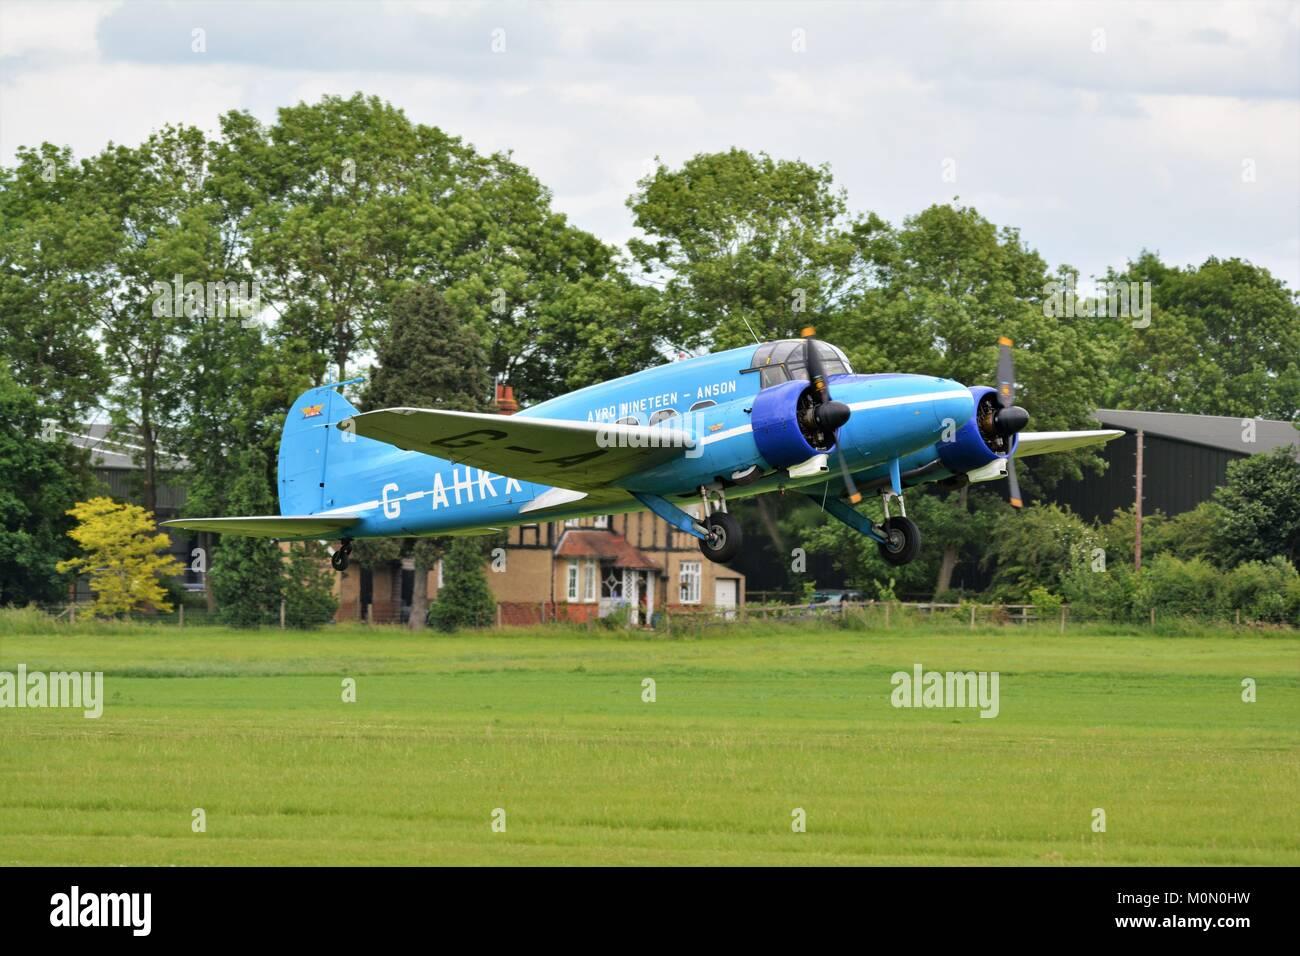 Avro Anson G-AHLX civil light passenger monoplane at Shuttleworth collection airshow 2017 - Stock Image